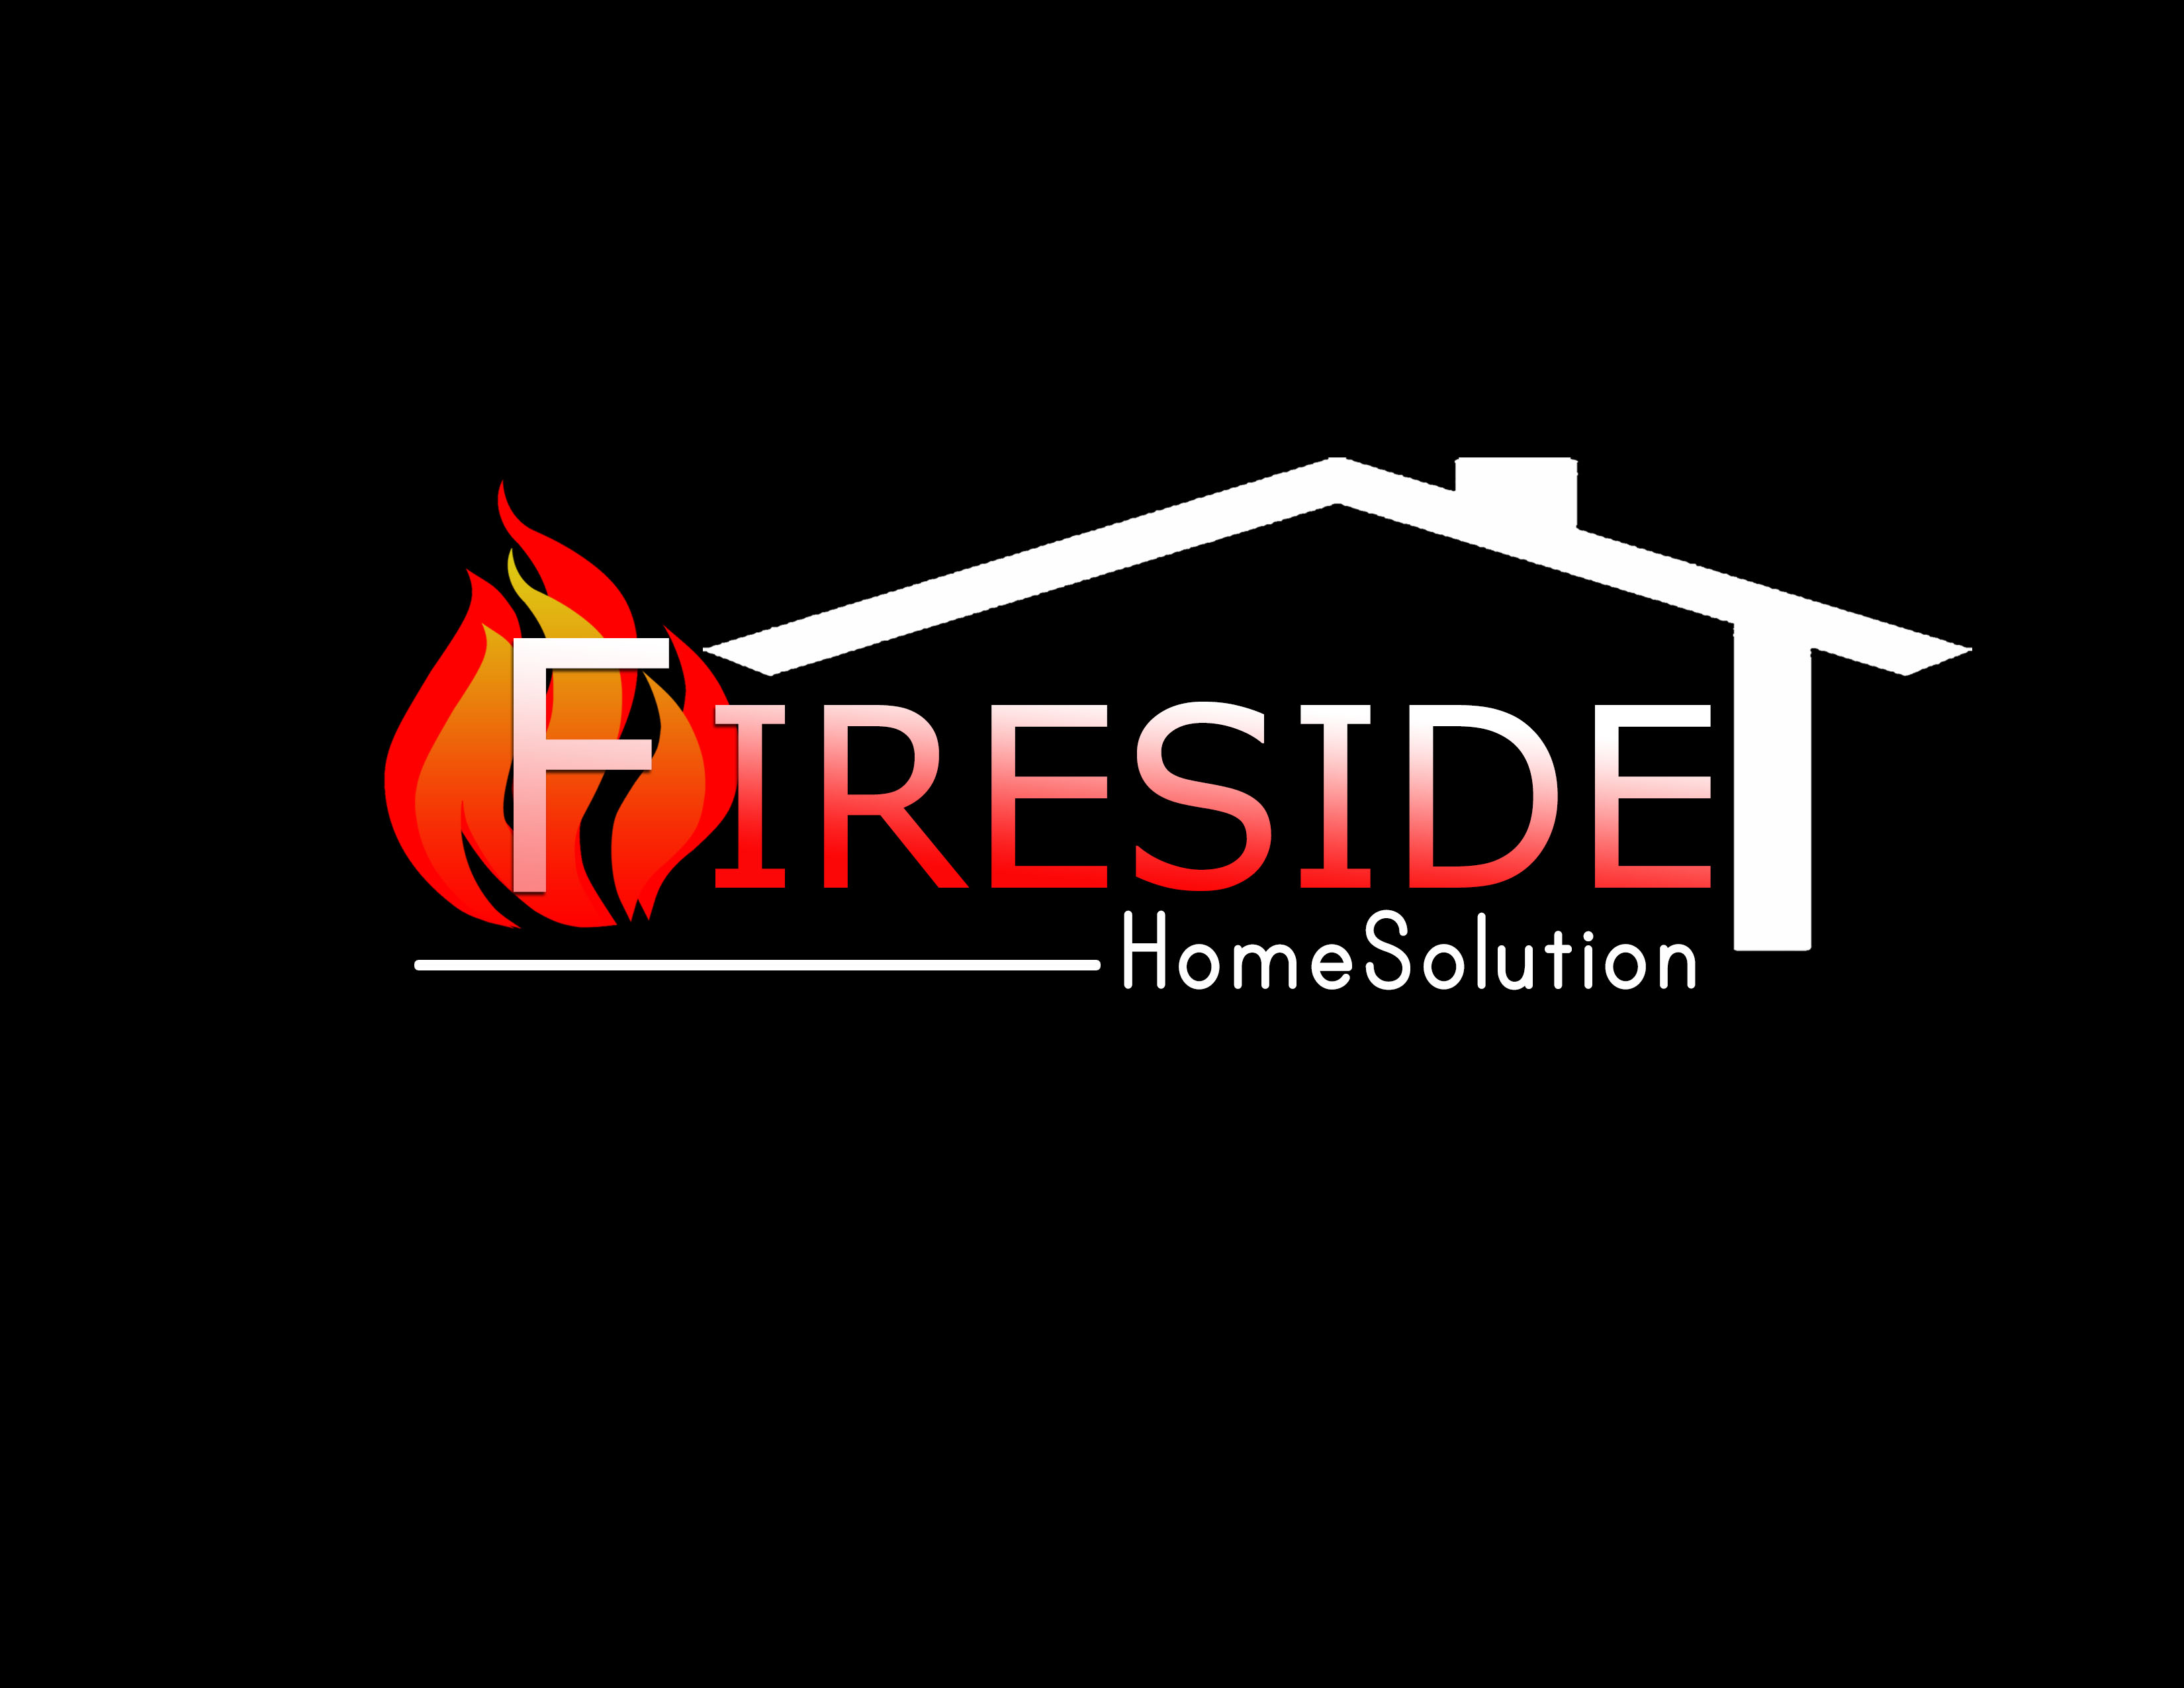 Logo Design by Kathrina Arceta - Entry No. 34 in the Logo Design Contest Creative Logo Design for Fireside Heating Solutions Ltd..